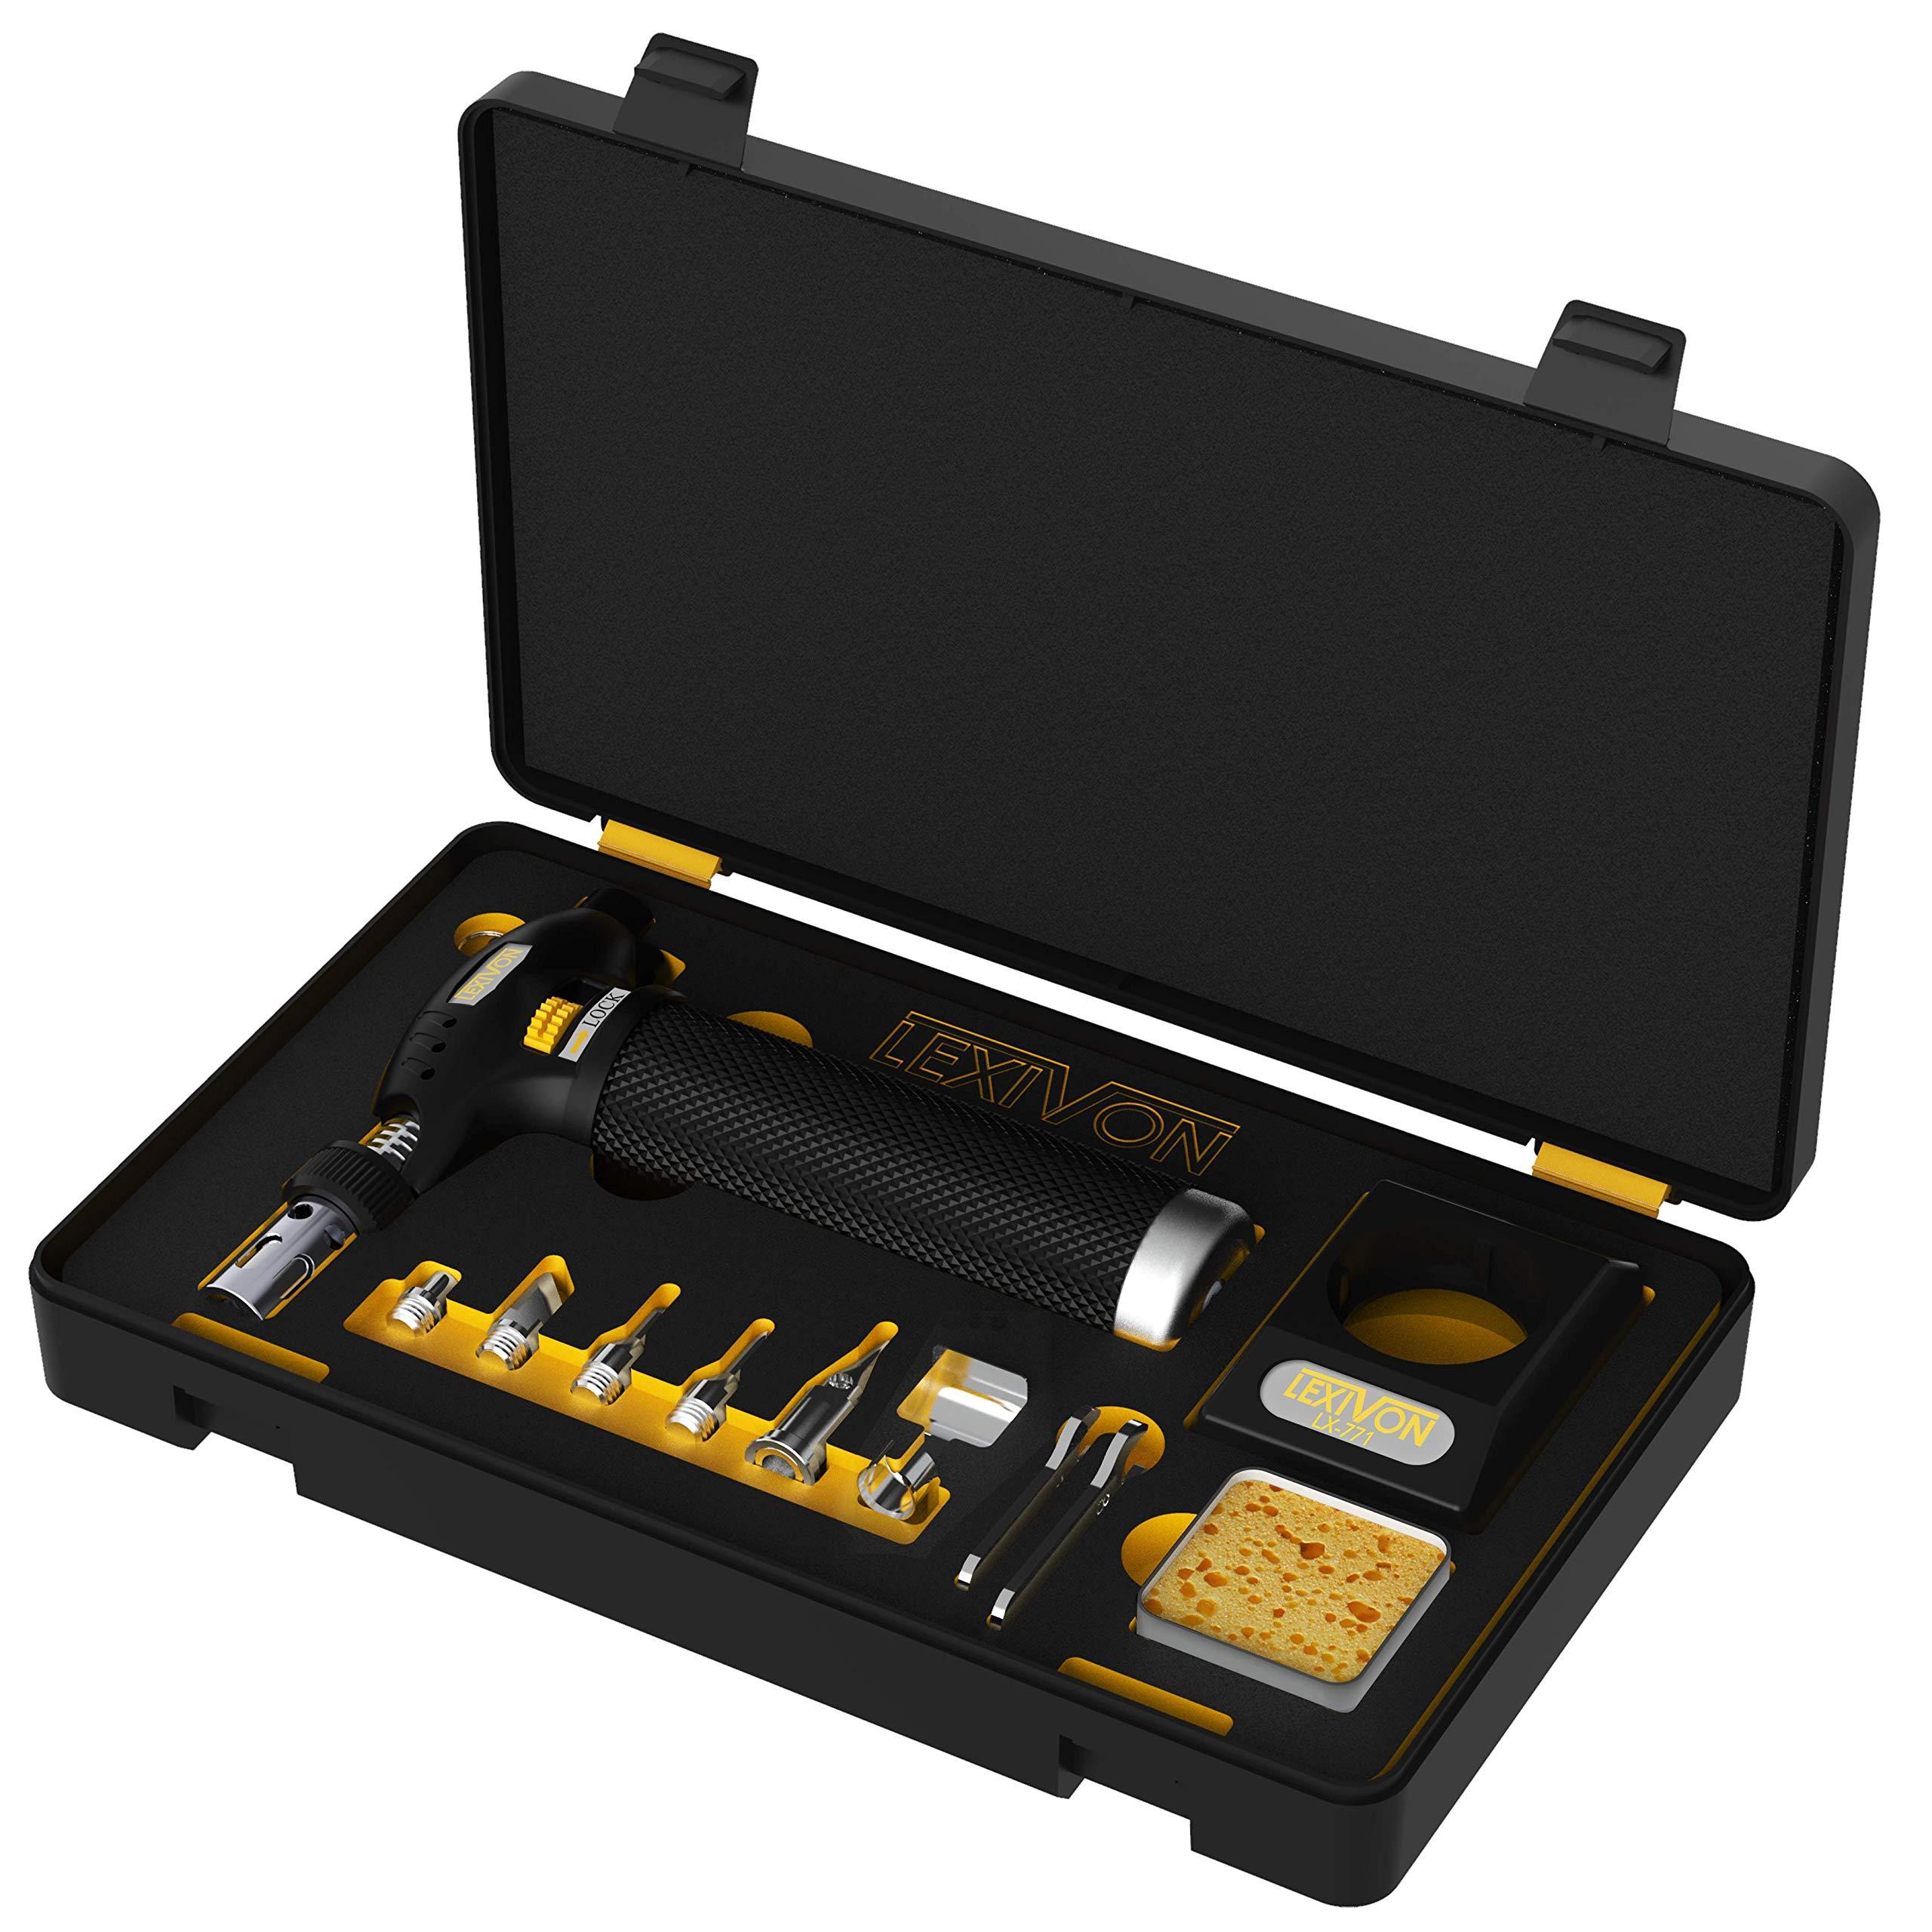 LEXIVON Butane Torch Multi-Function Kit   Premium Self-Igniting Soldering Station with Adjustable Flame   Pro Grade 125-Watt Equivalent (LX-771)